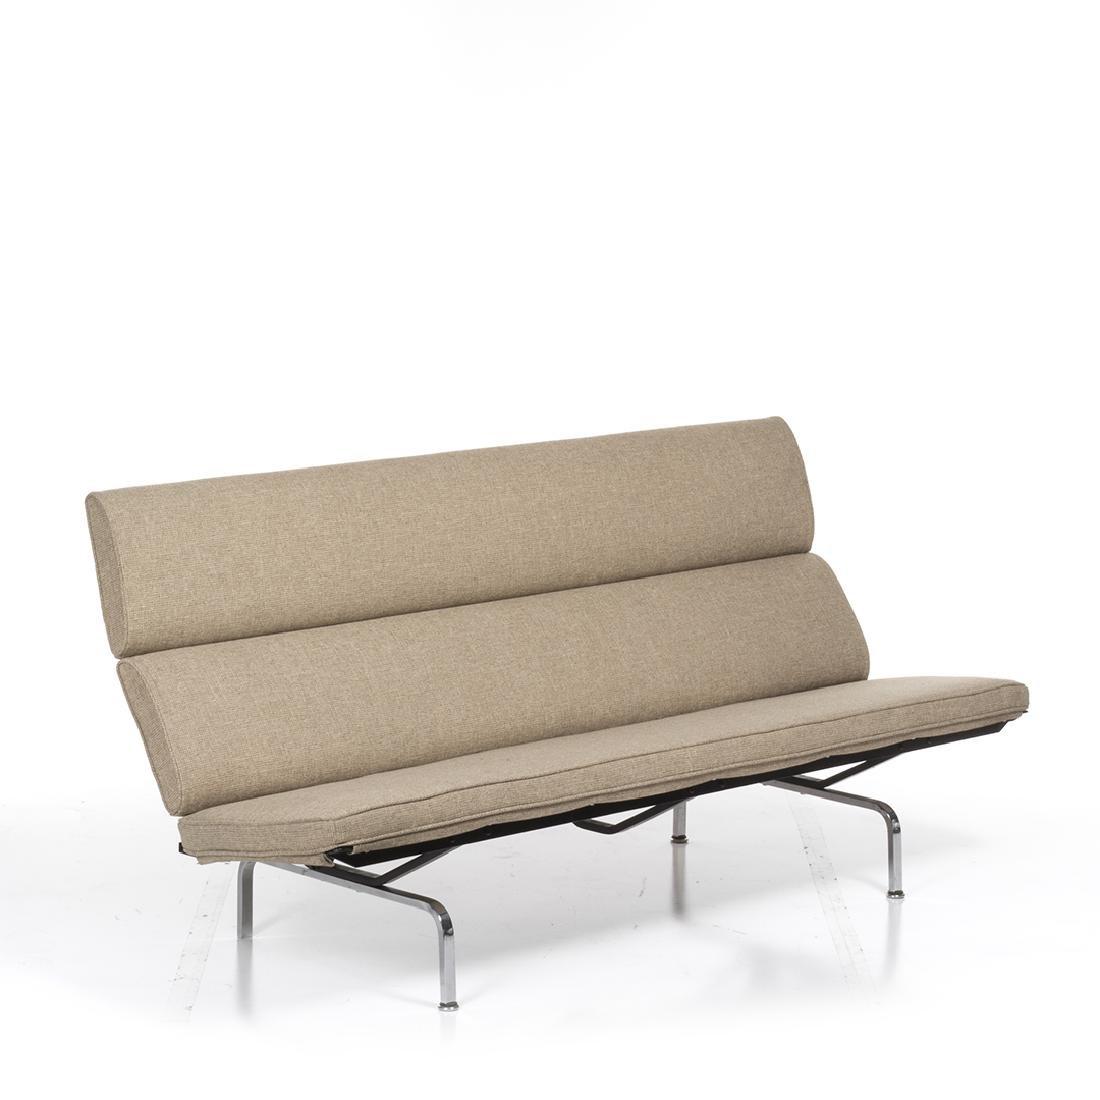 Eames Compact Sofa - 3